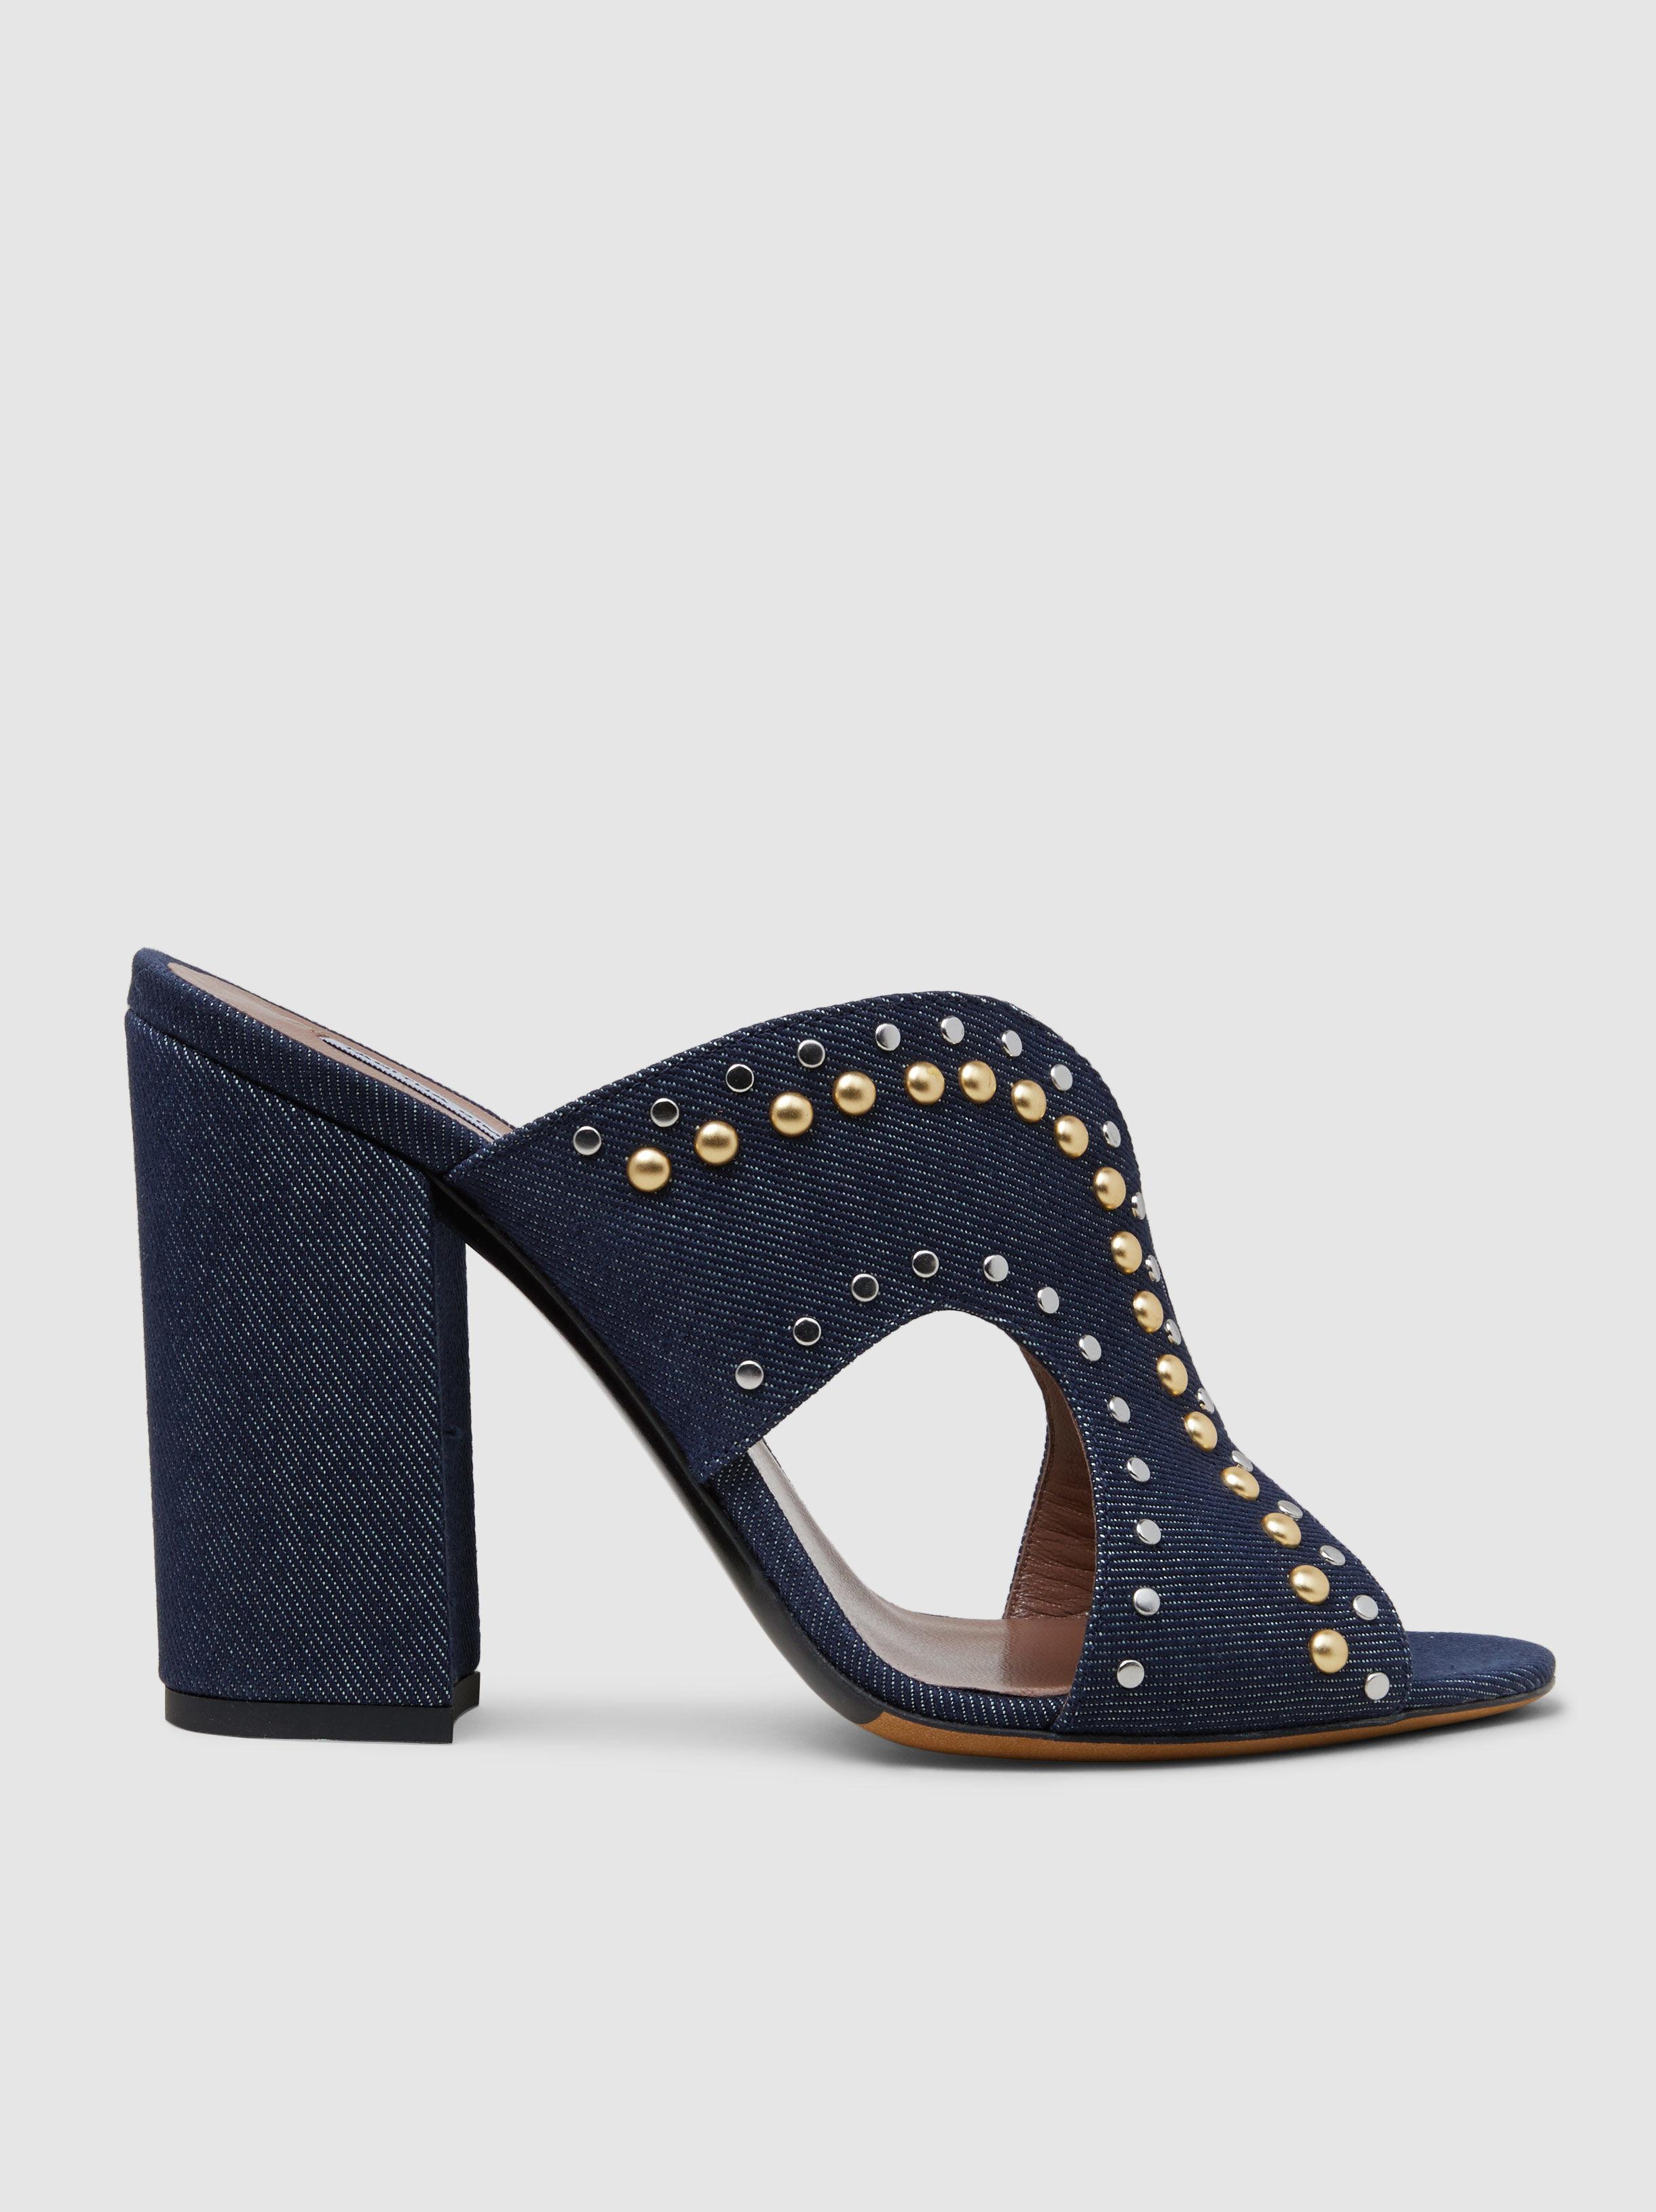 Tabitha Simmons Celia Studded Denim Sandals fKJAzJi